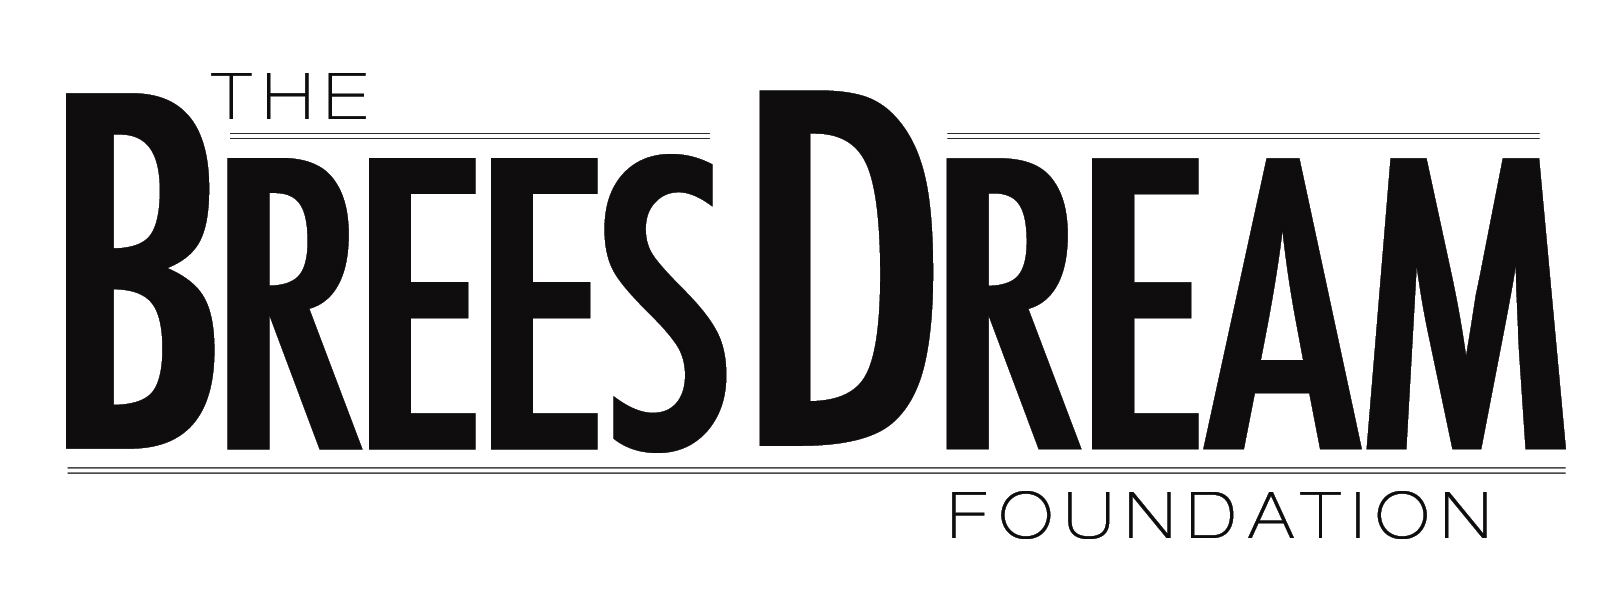 BREES_logo.jpg